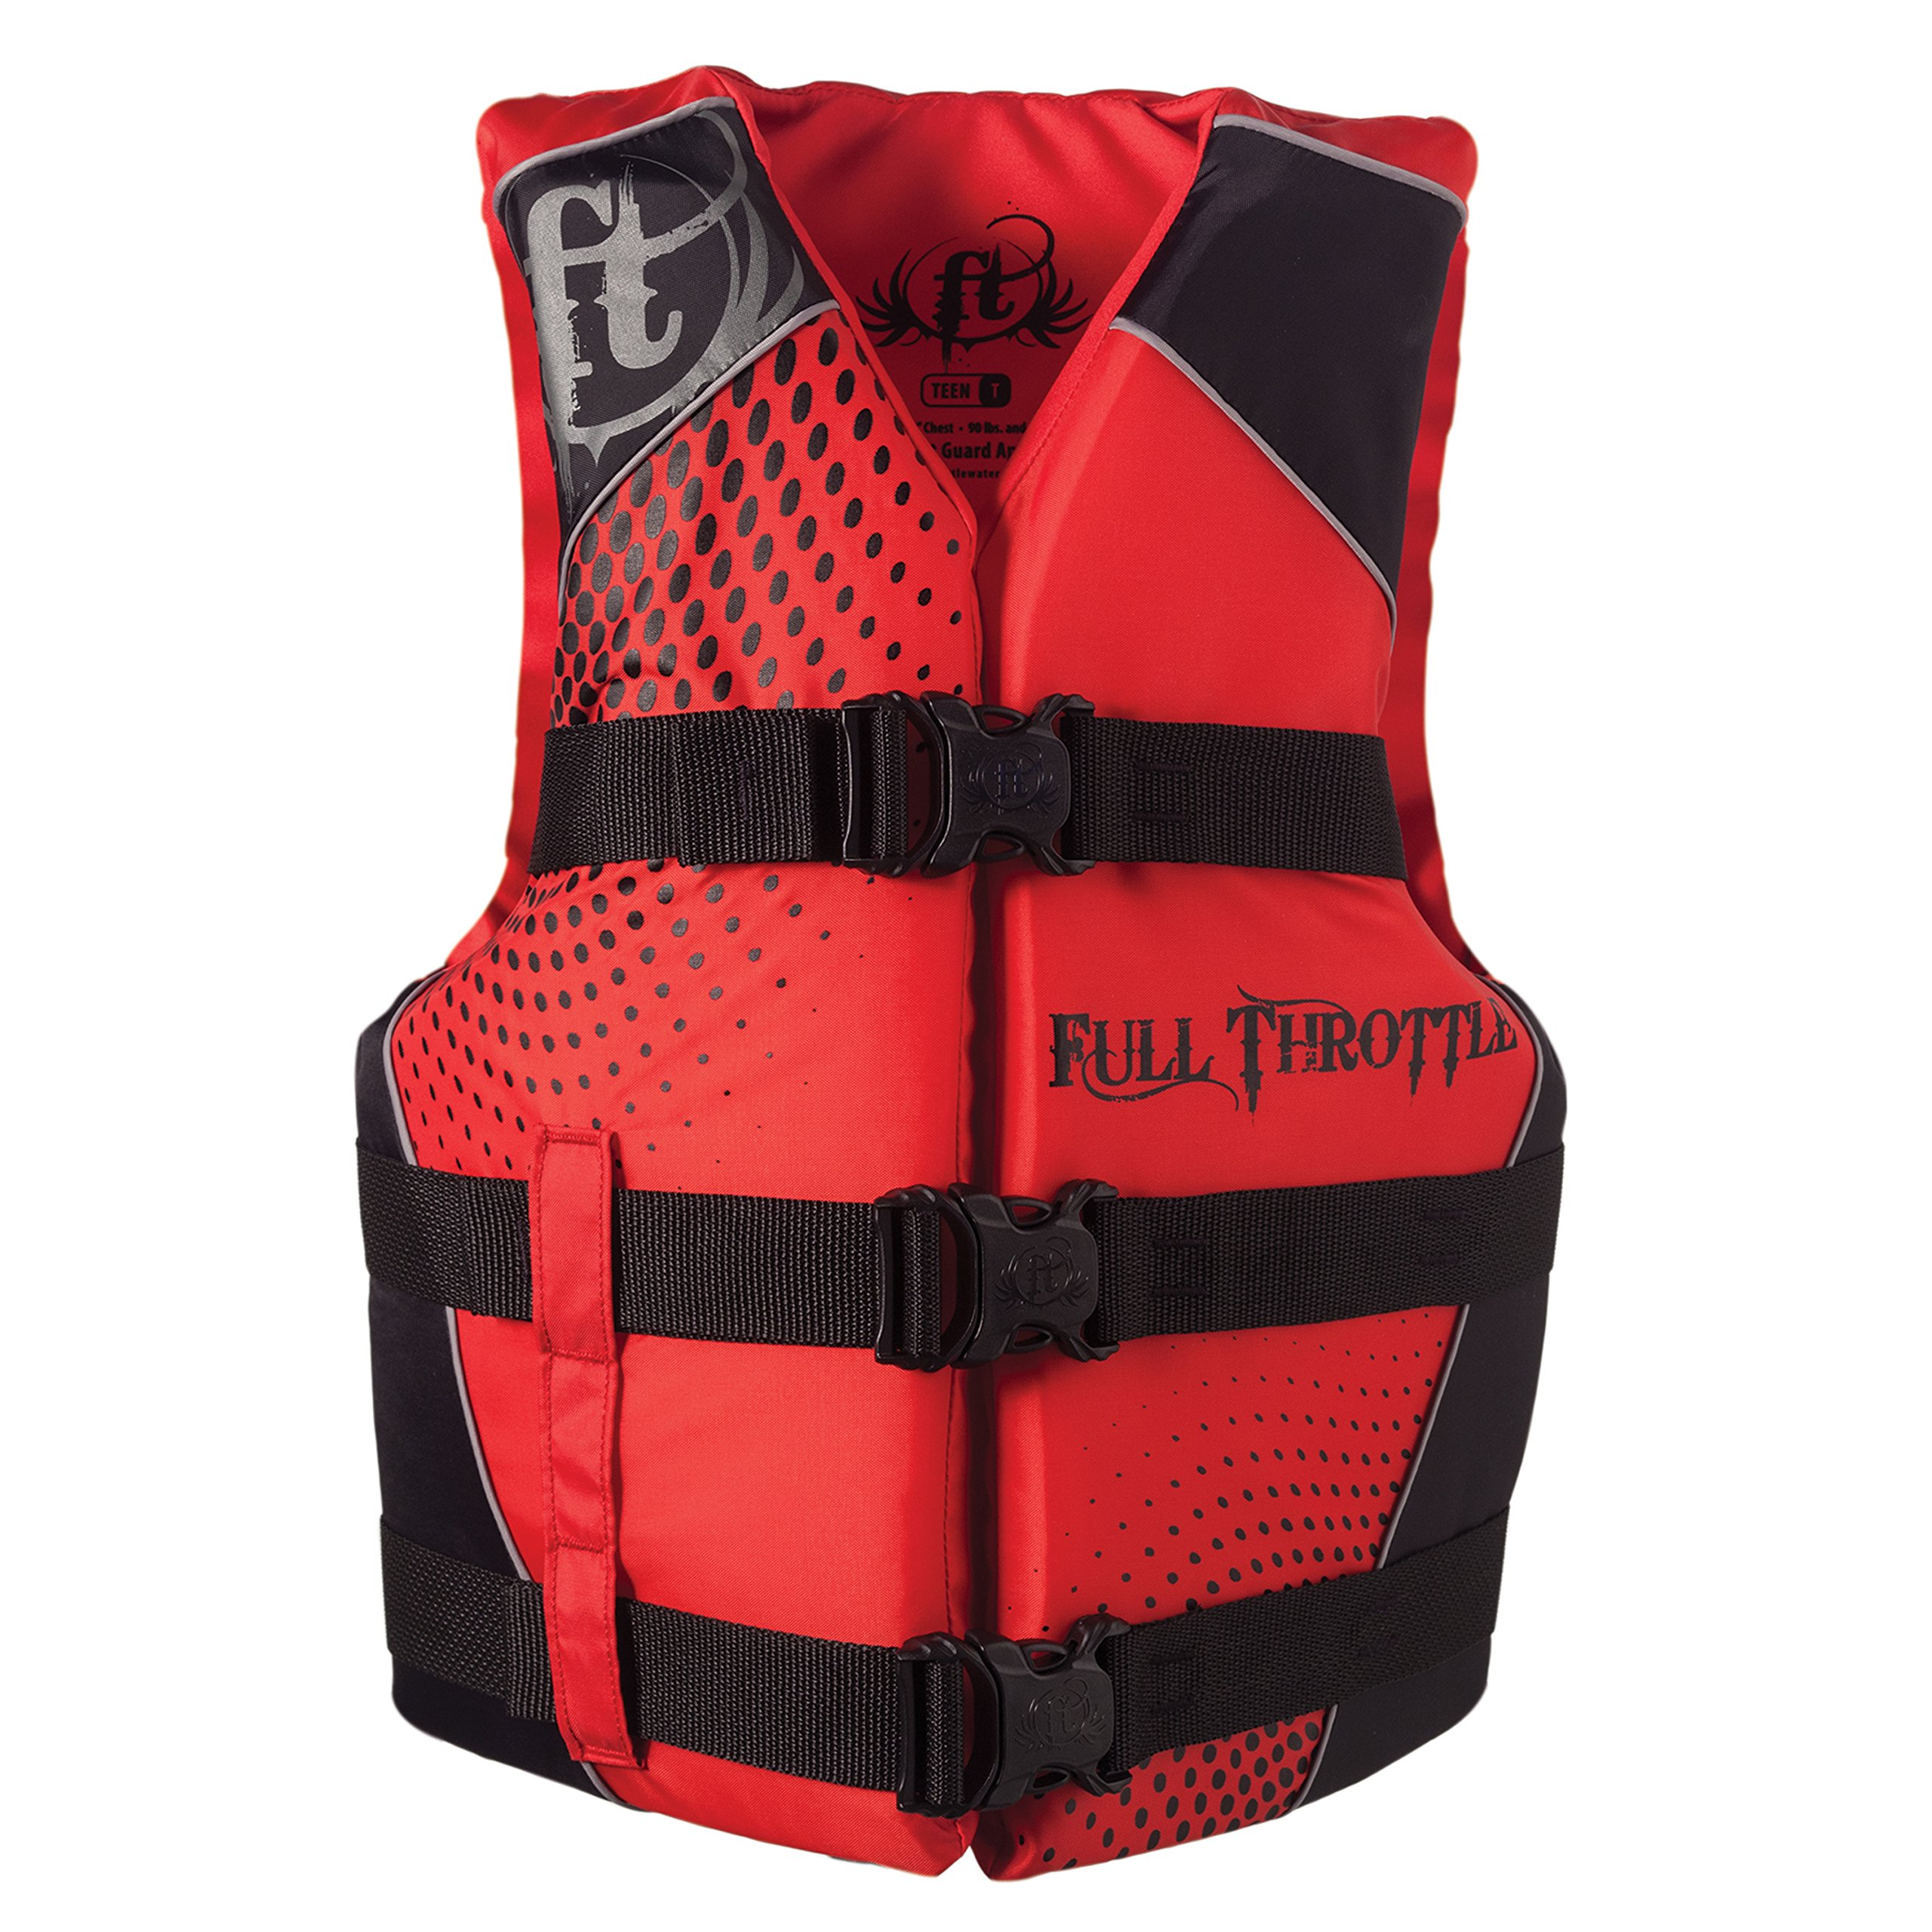 Full Throttle Red/Black Teen Nylon Watersports Vest